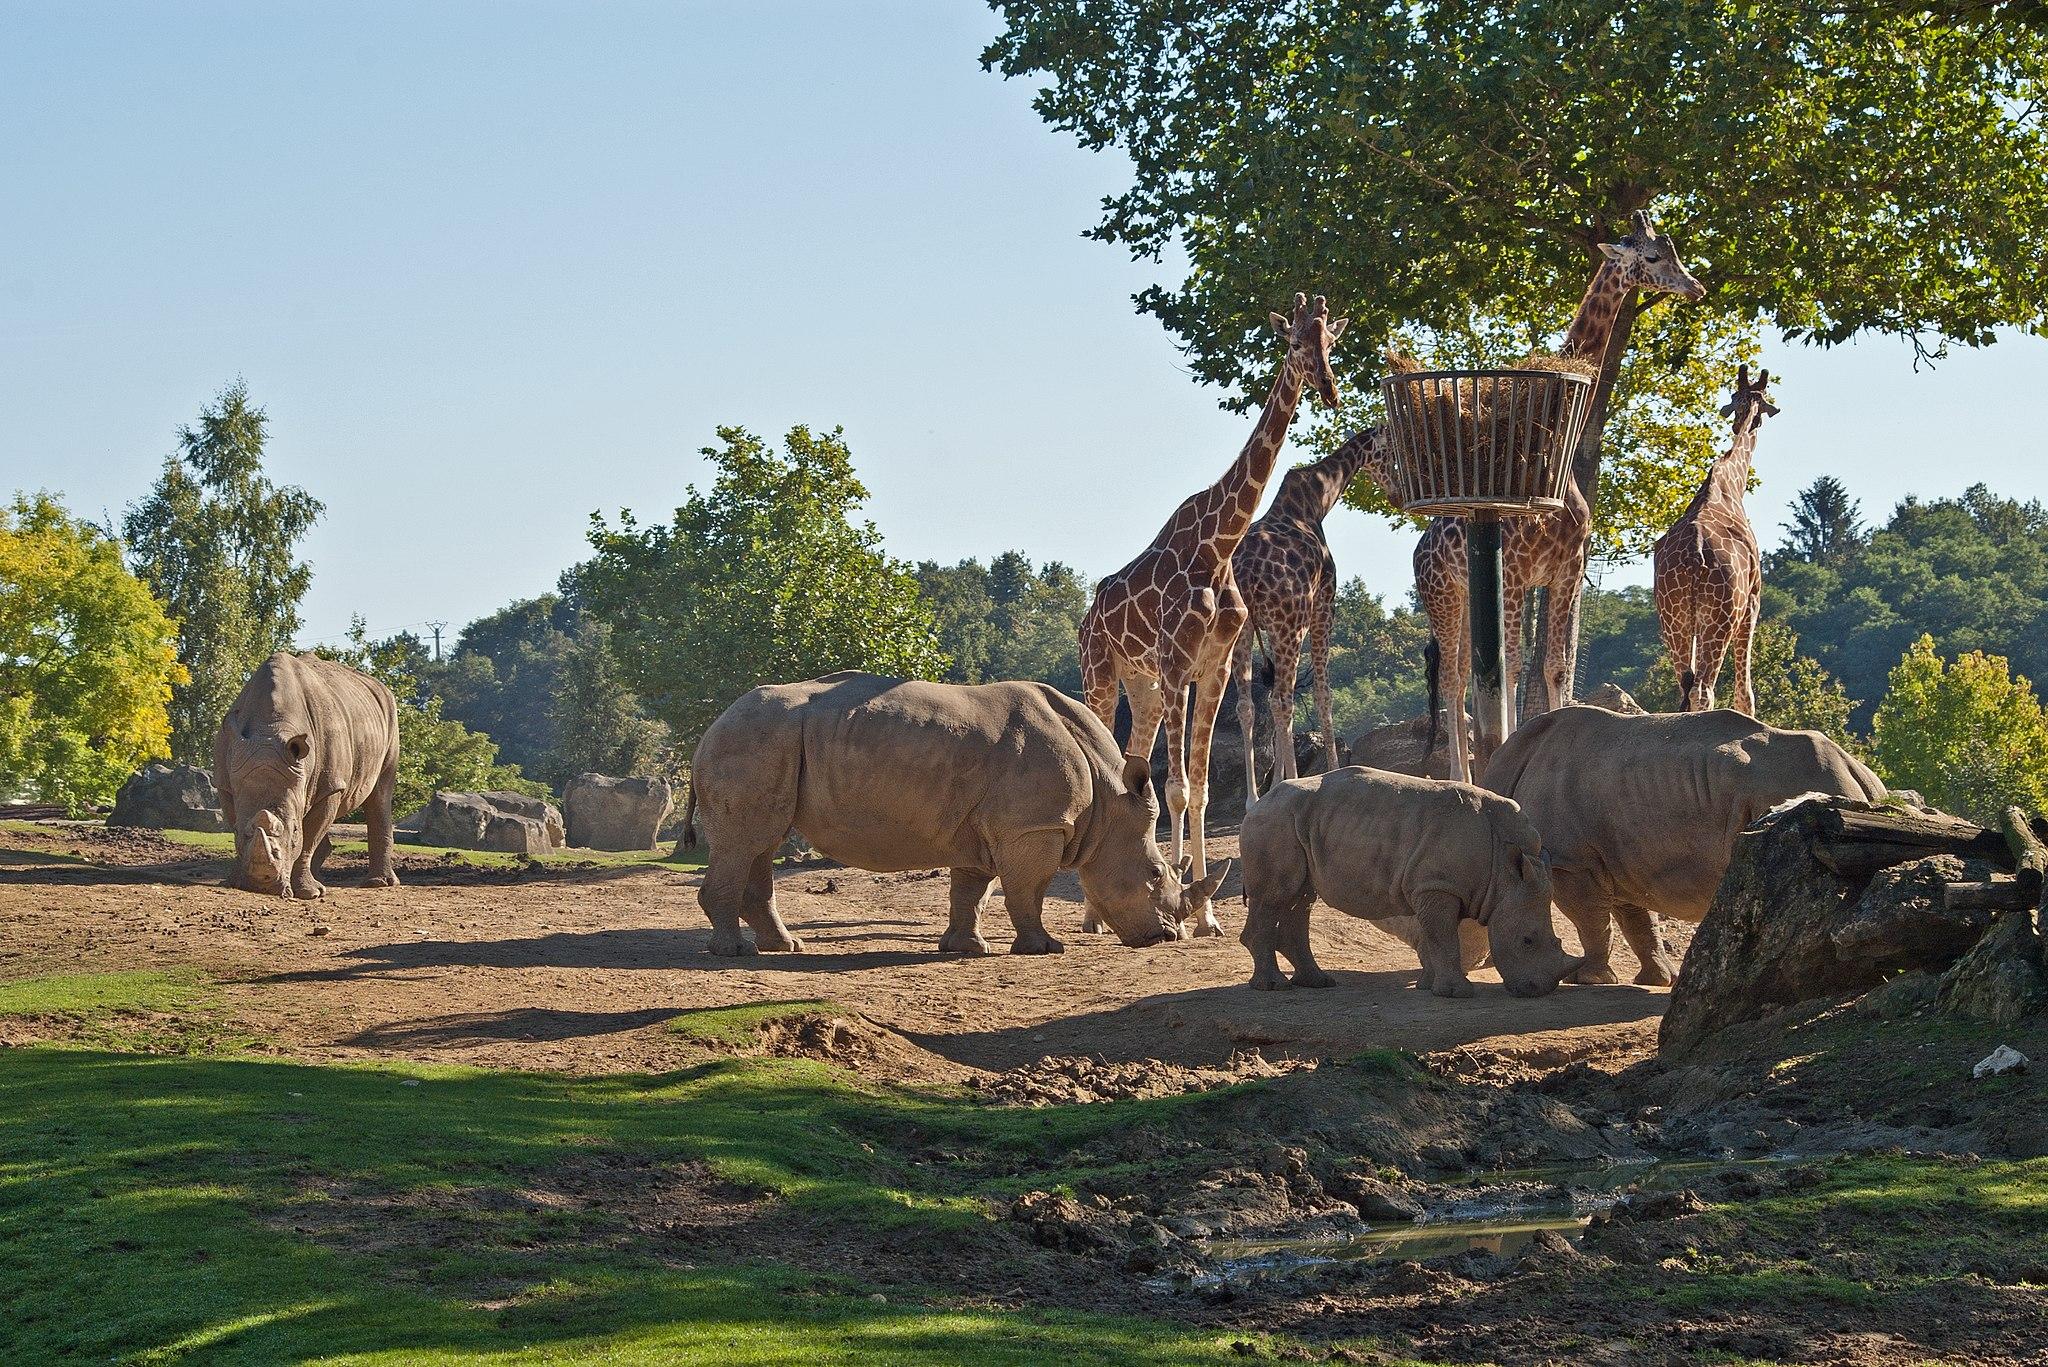 Zoo de Beauvais (Flickr, David Jolivet)